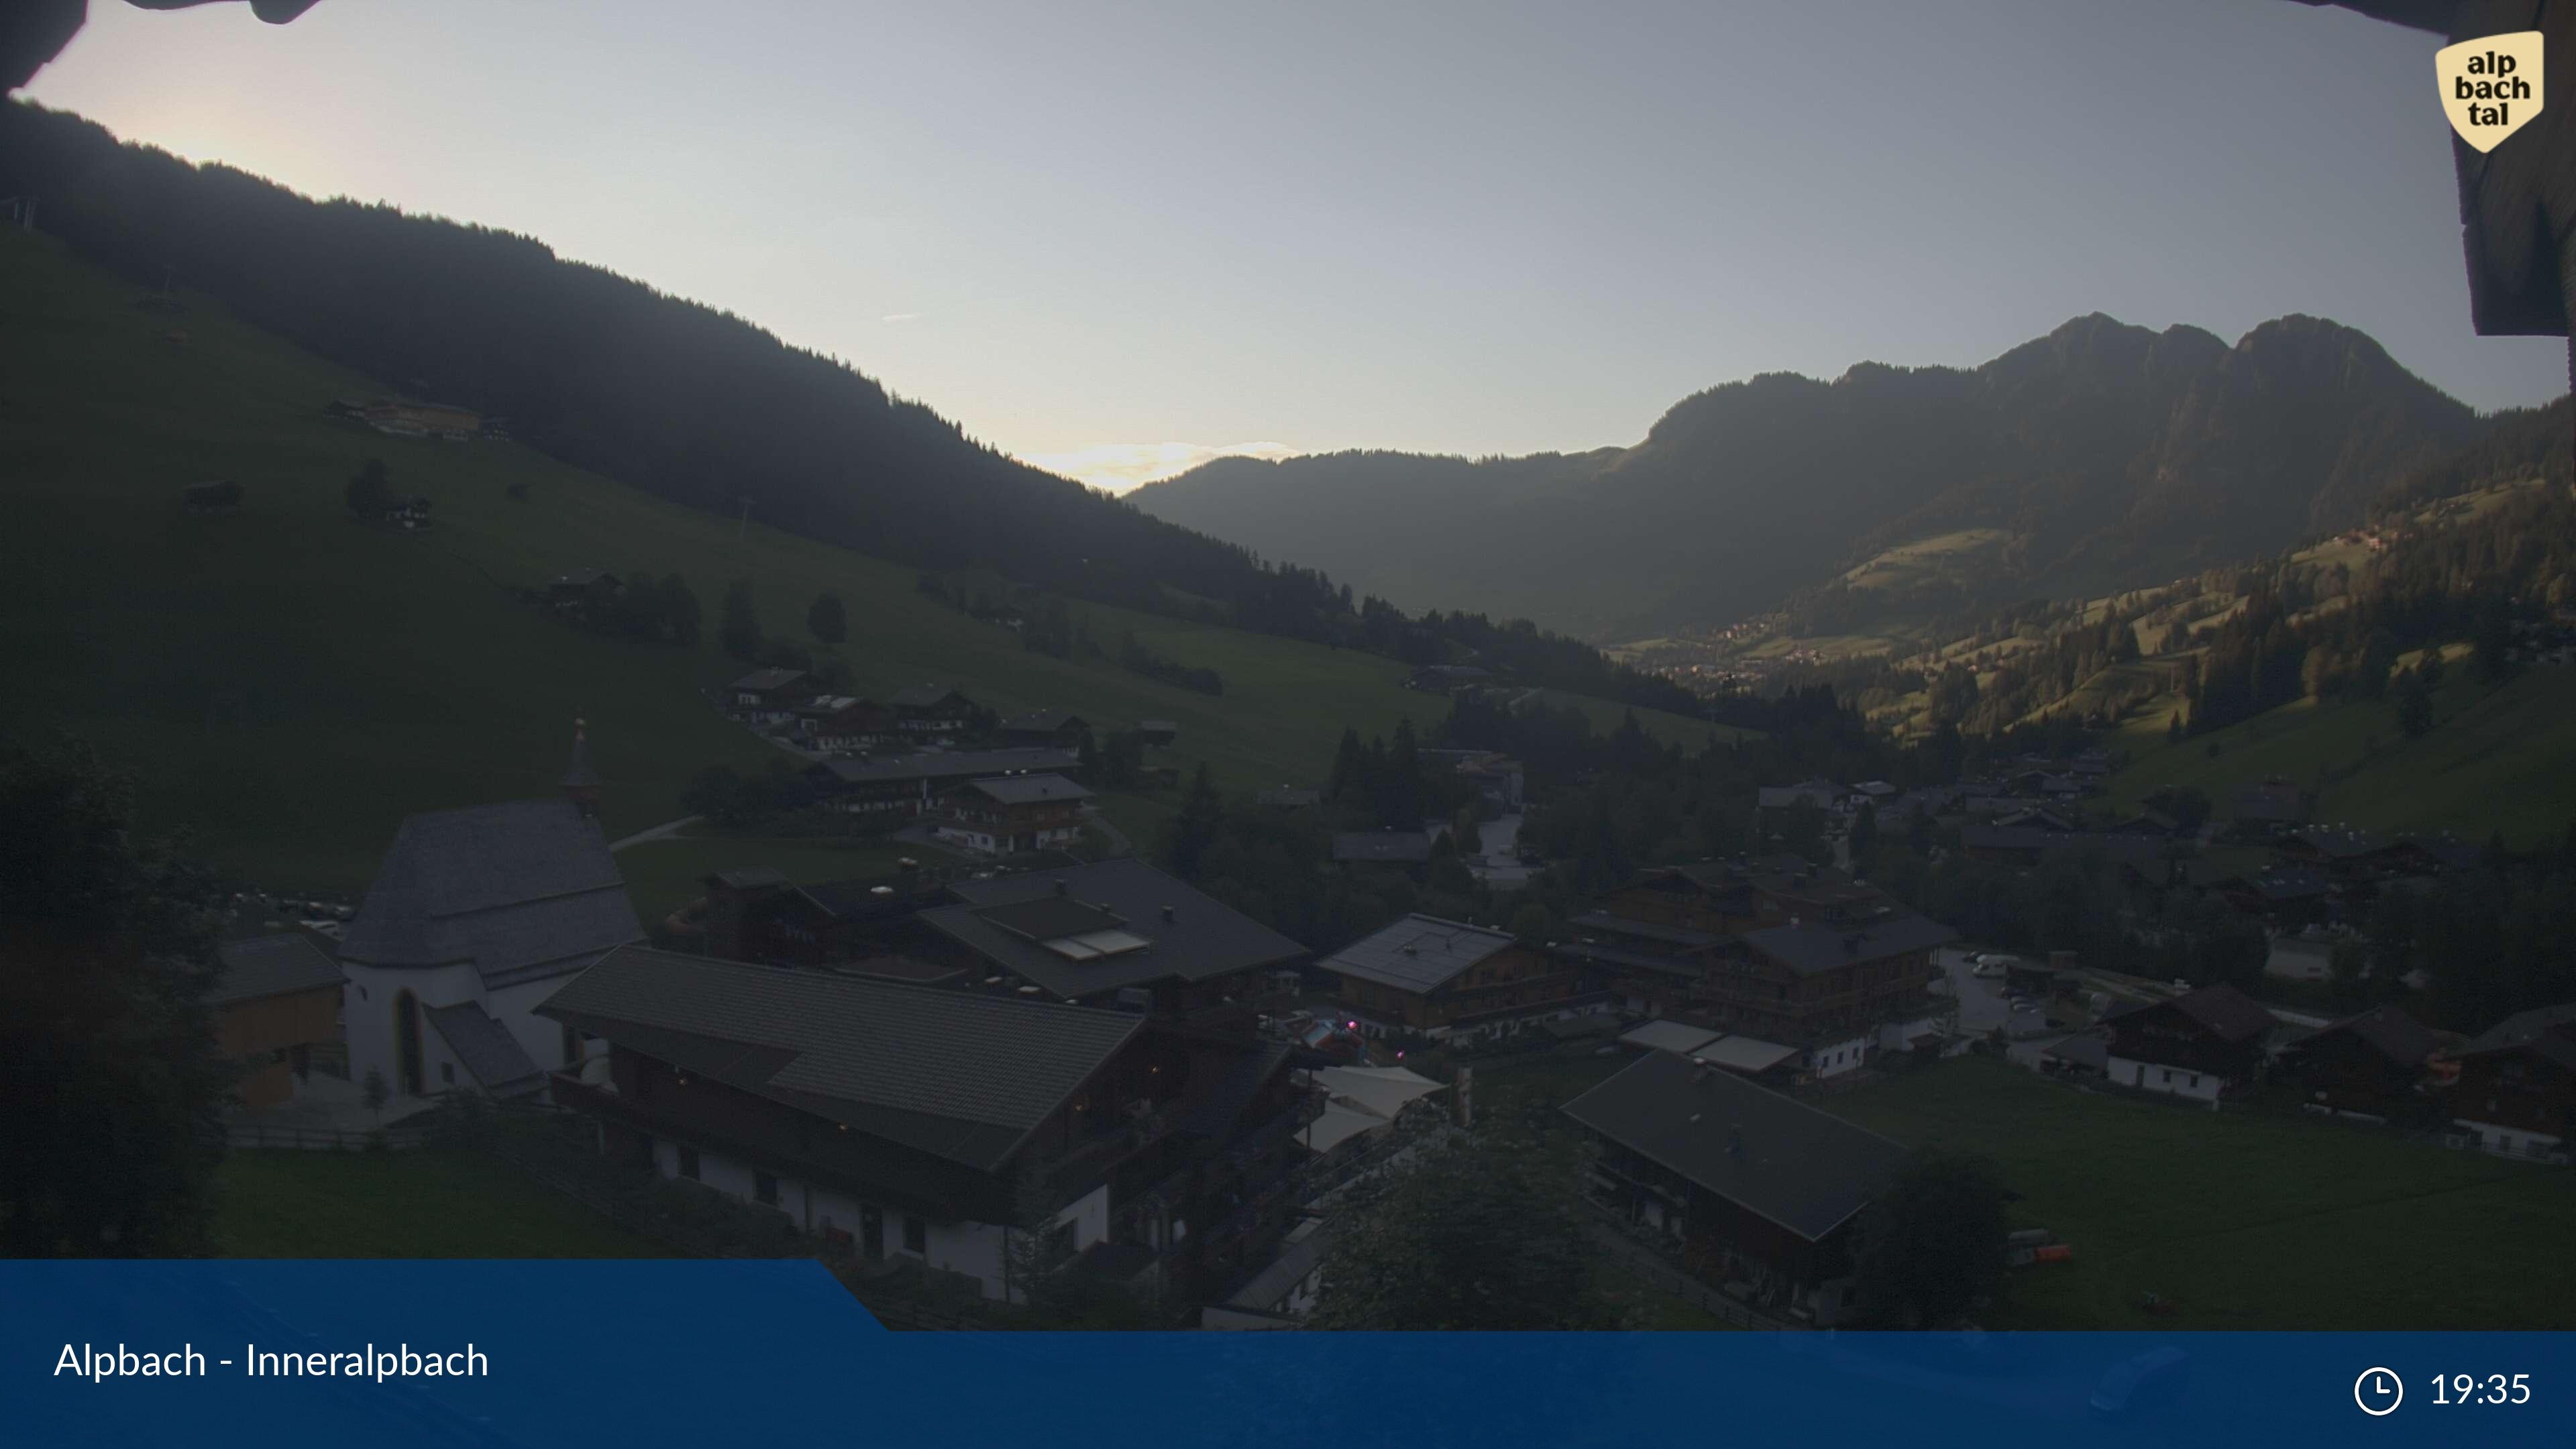 Live Alpbahtal web cam - Interalpbach